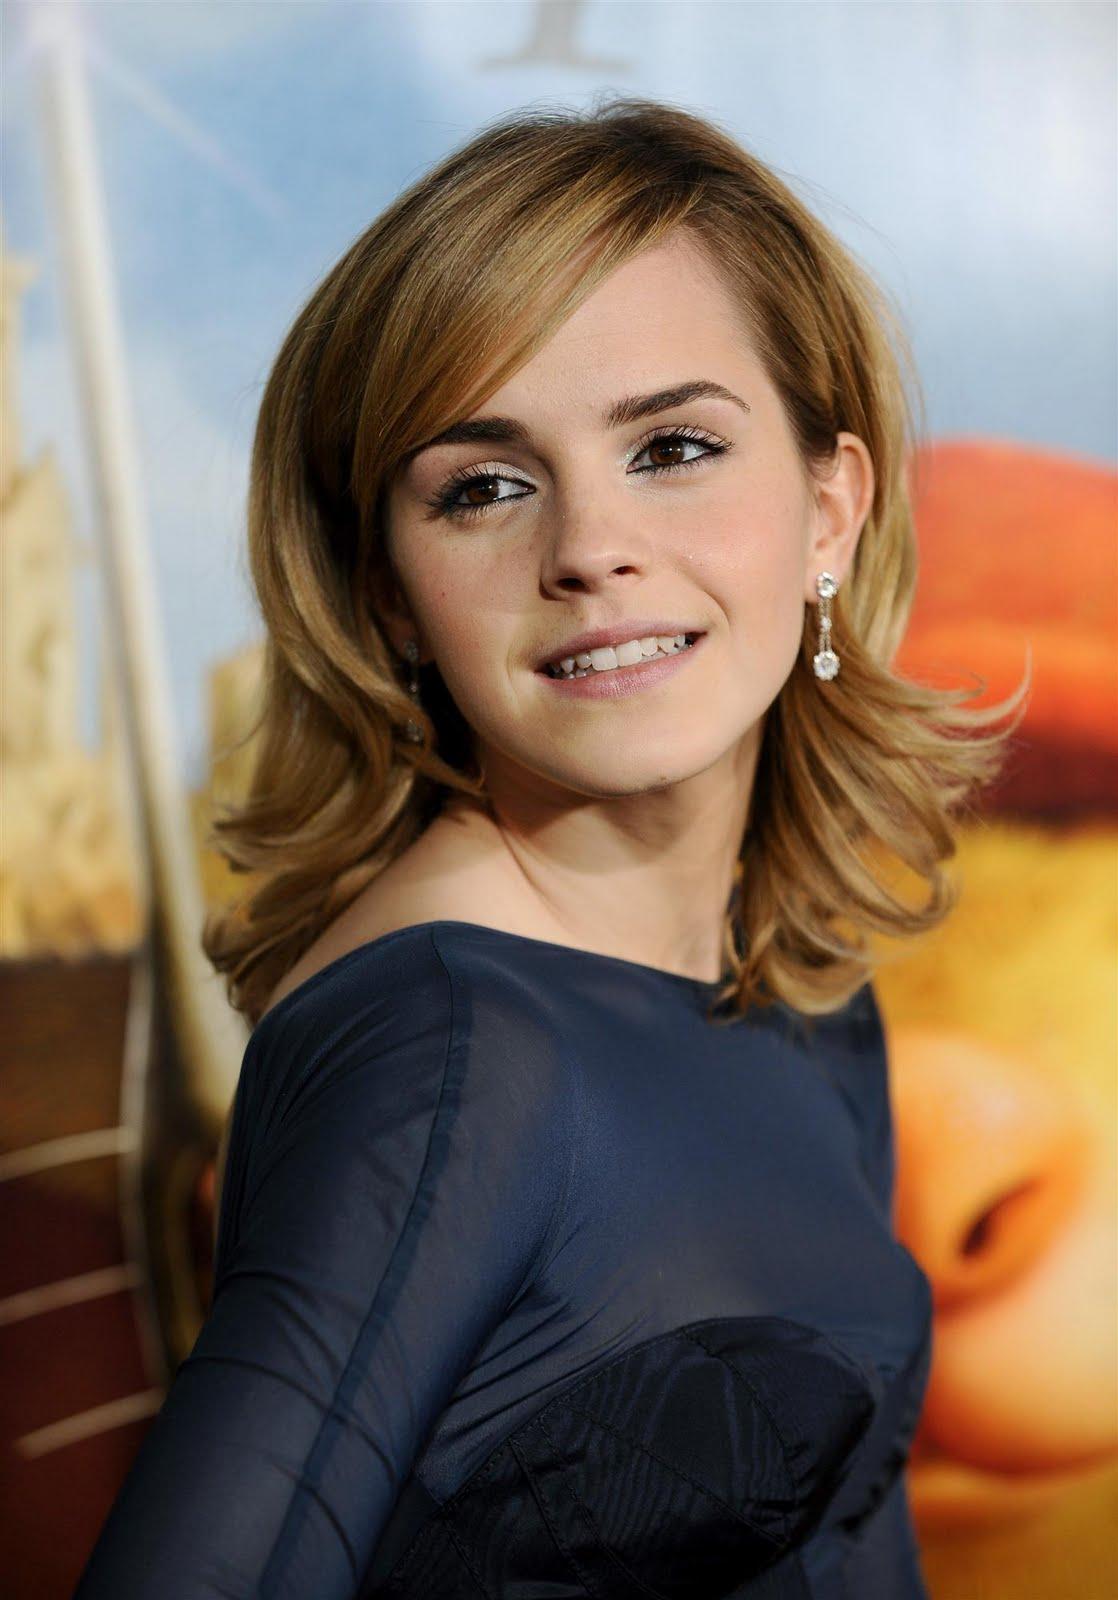 Emma Watson Straight Hairstyles